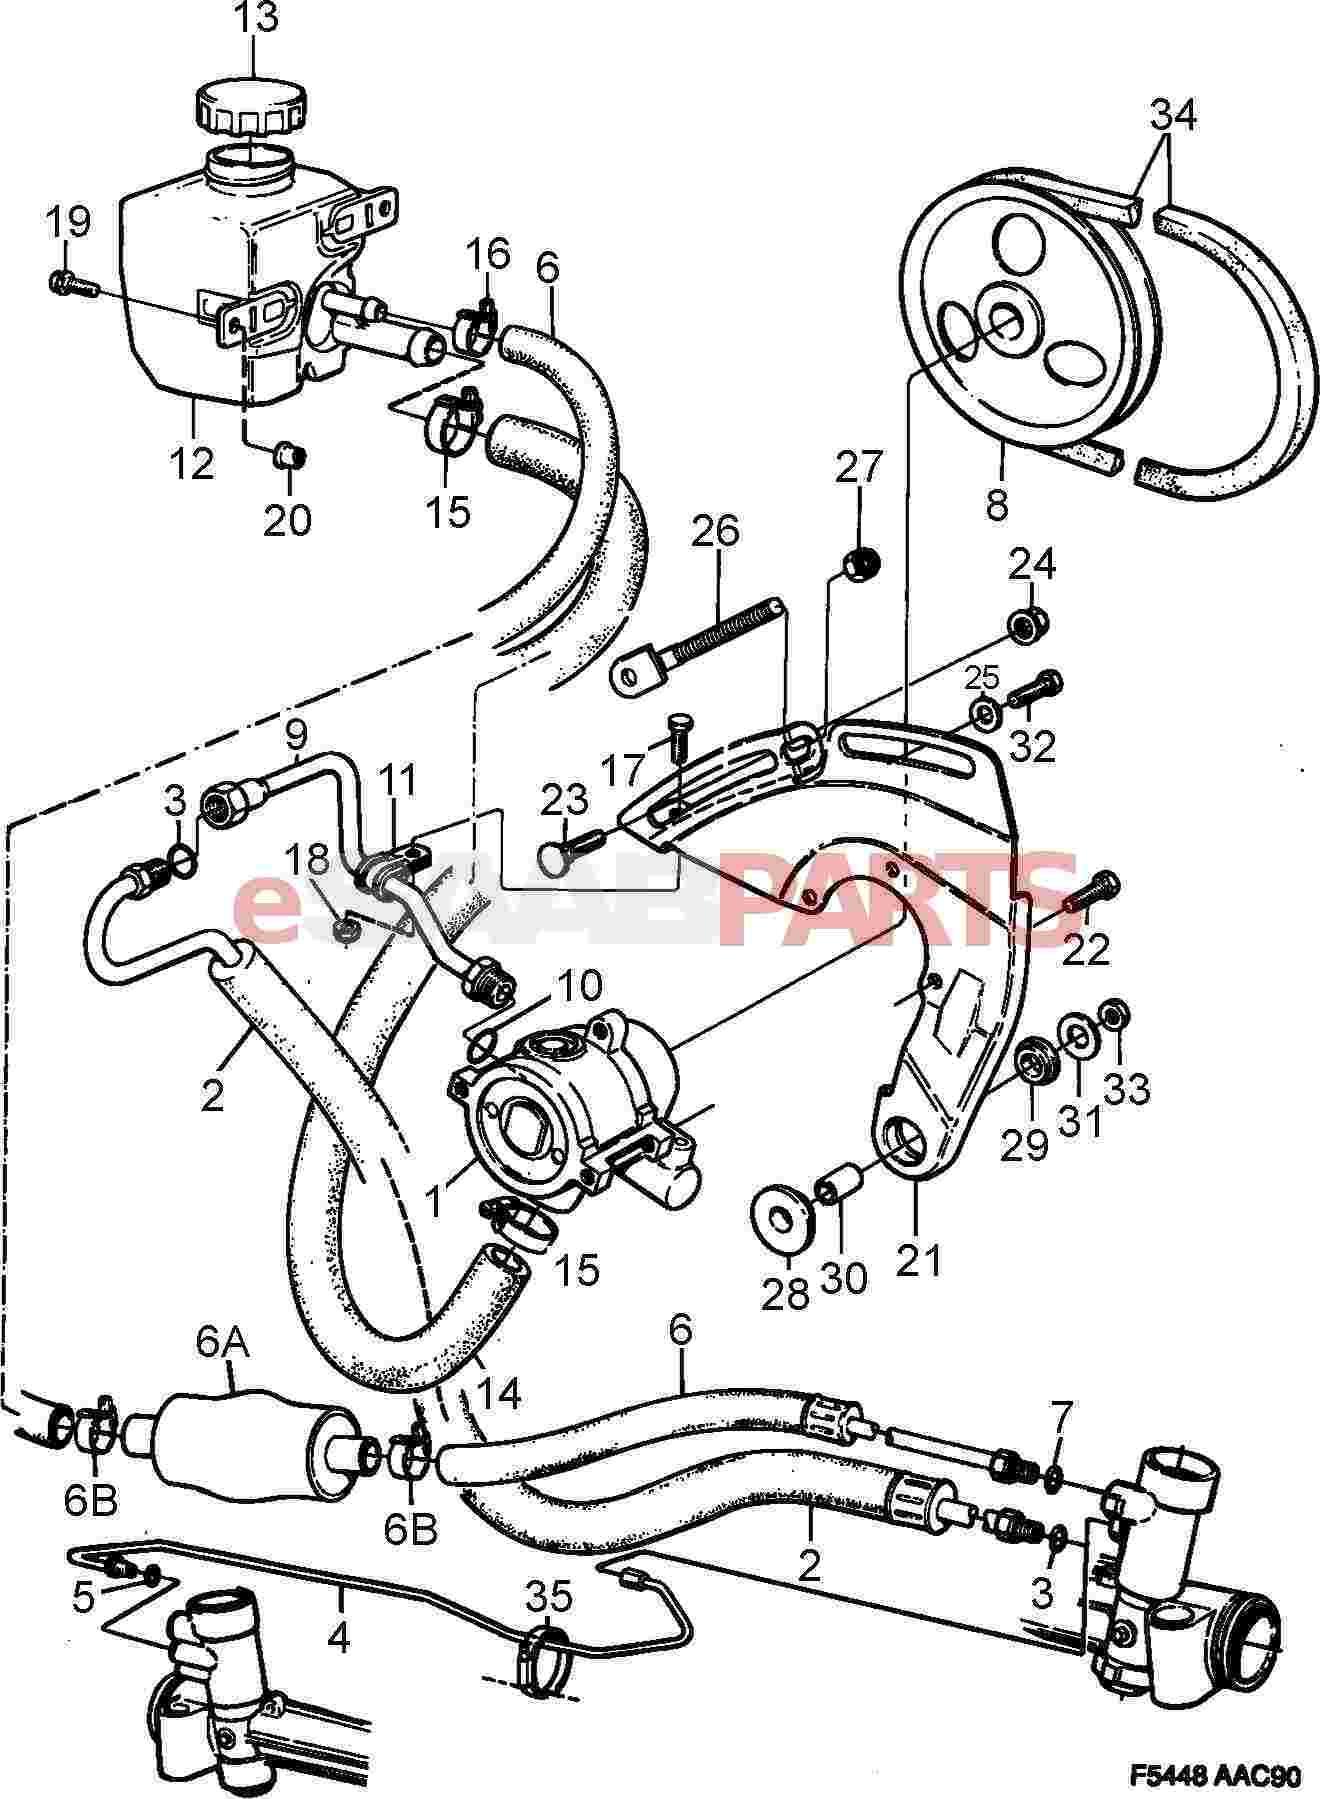 1991 saab 900 steering diagram great installation of wiring diagram 1968 Beetle Wiring Diagram esaabparts saab 900 u003e front wheel suspension parts u003e steering rh esaabparts 1991 saab